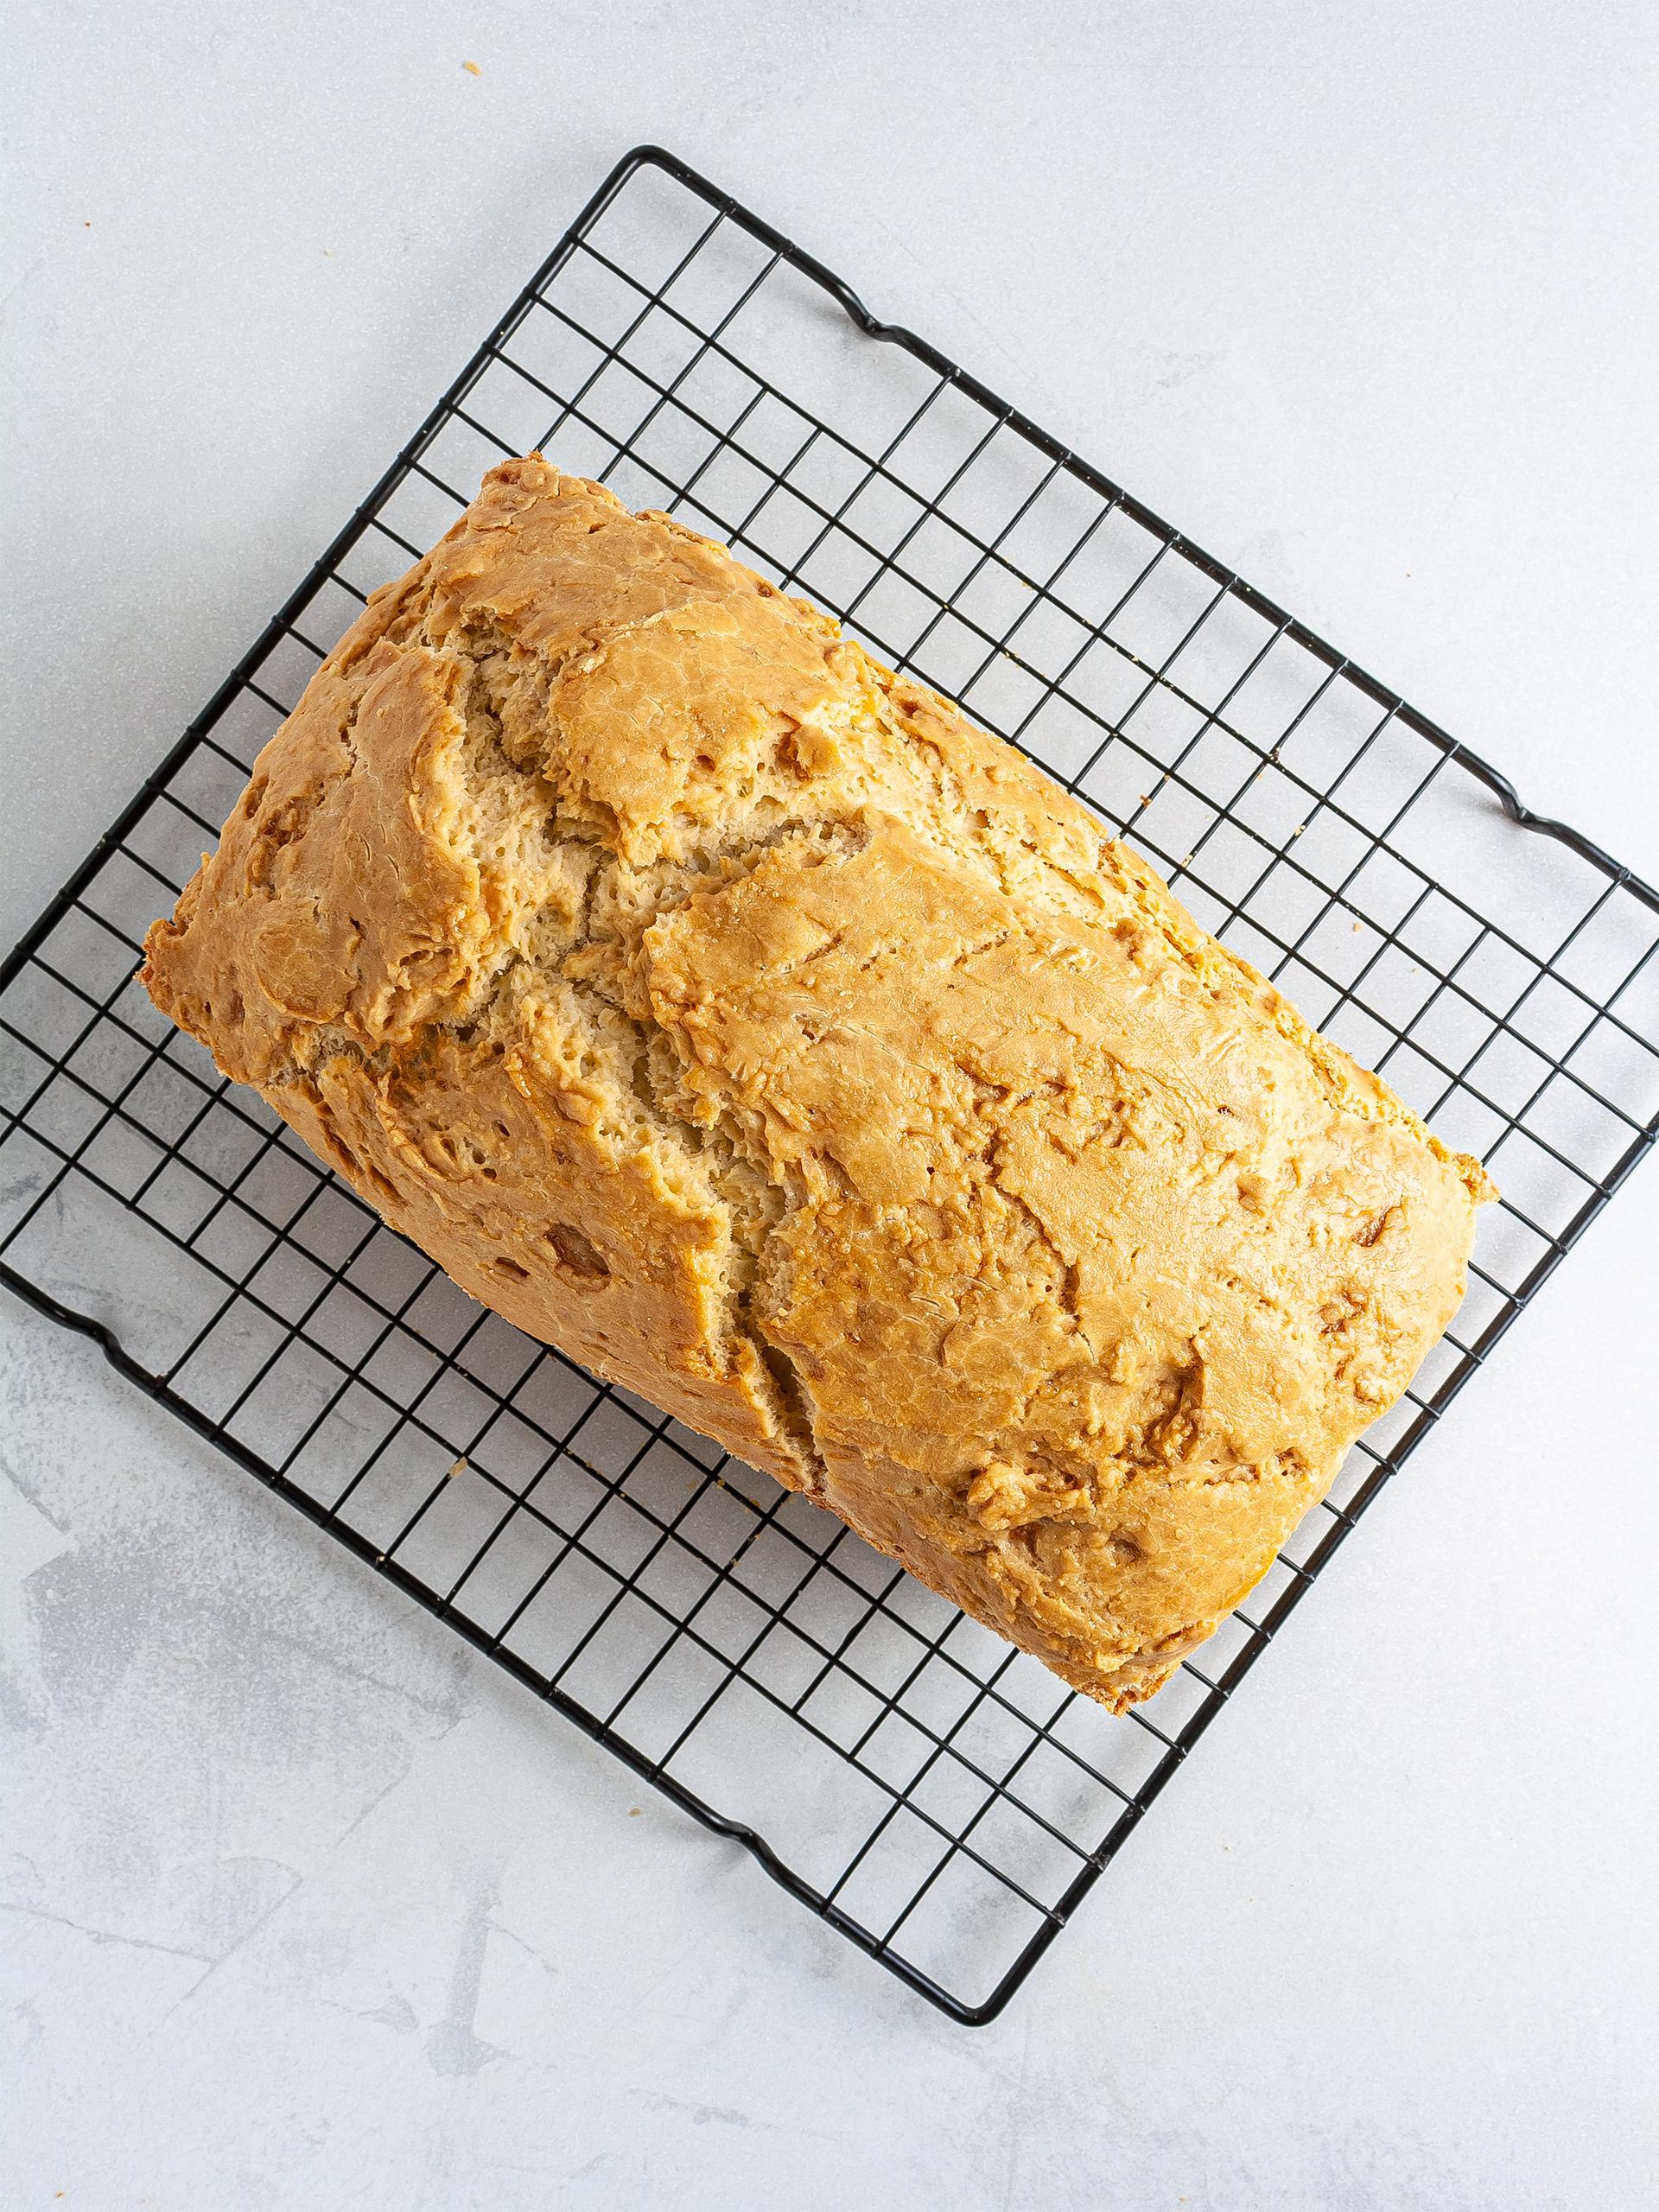 Baked brioche bread